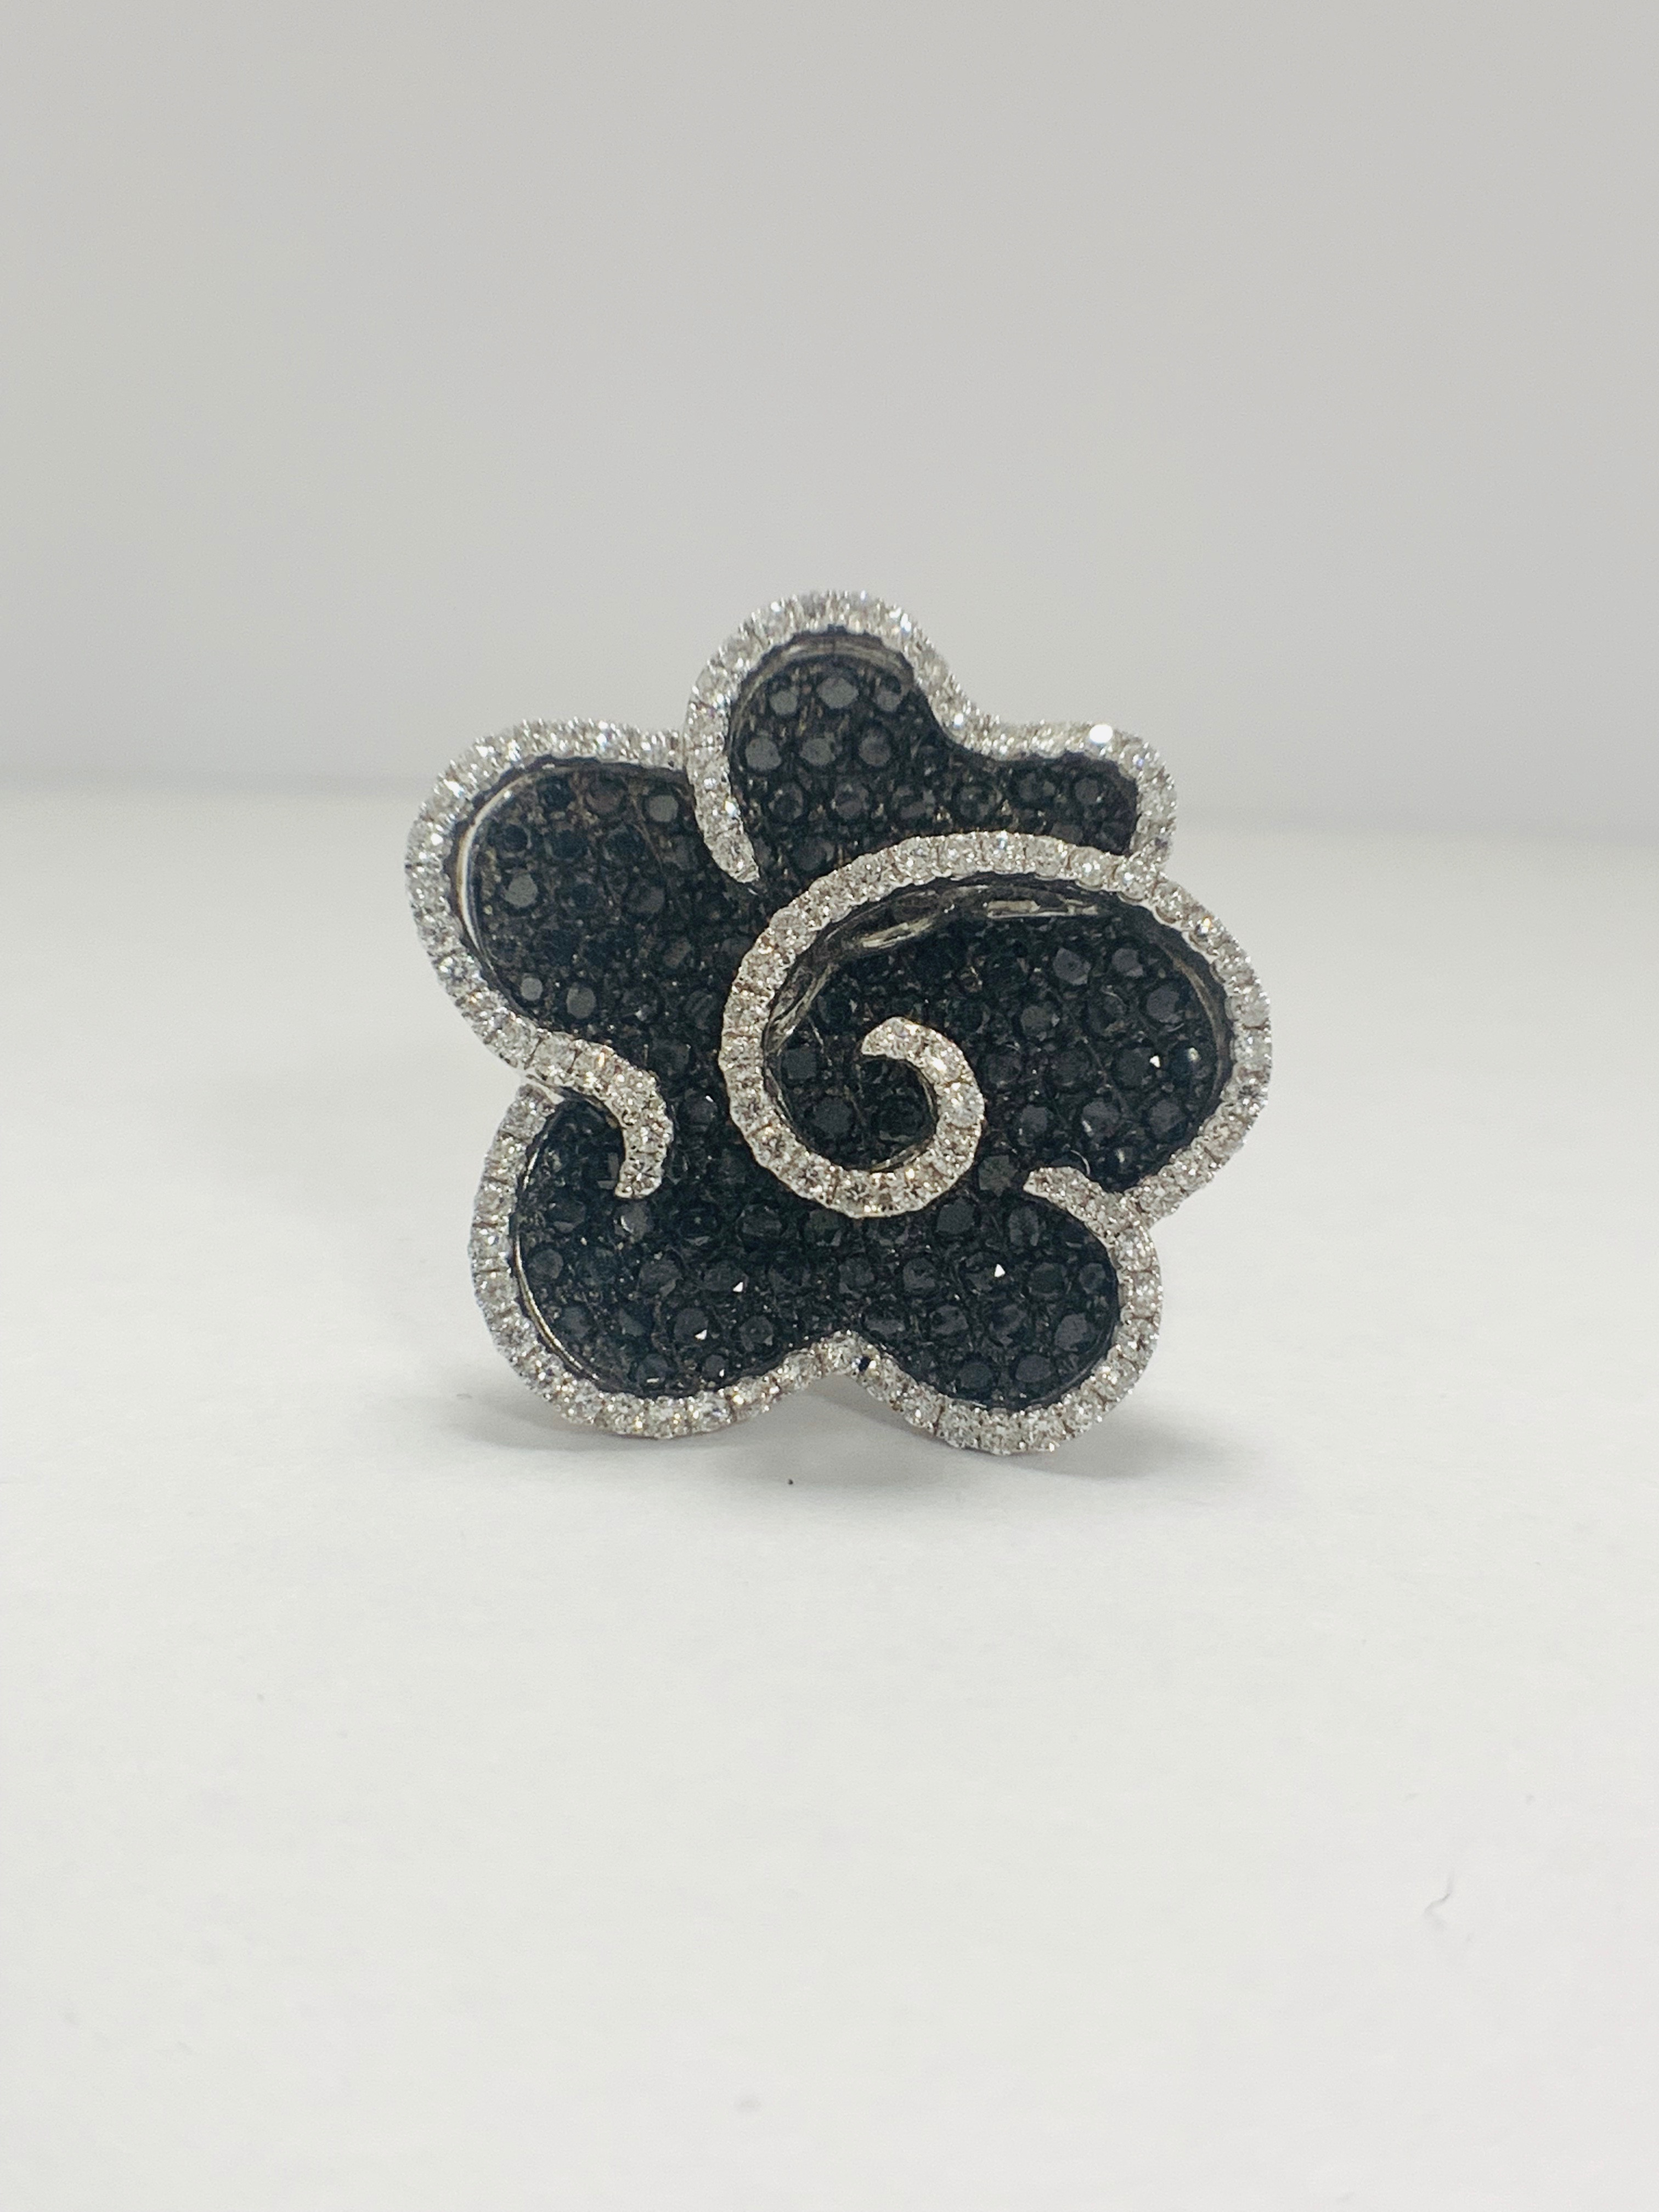 18ct White Gold Diamond flower design ring featuring 123 round cut, black Diamonds (2.25ct TBDW)